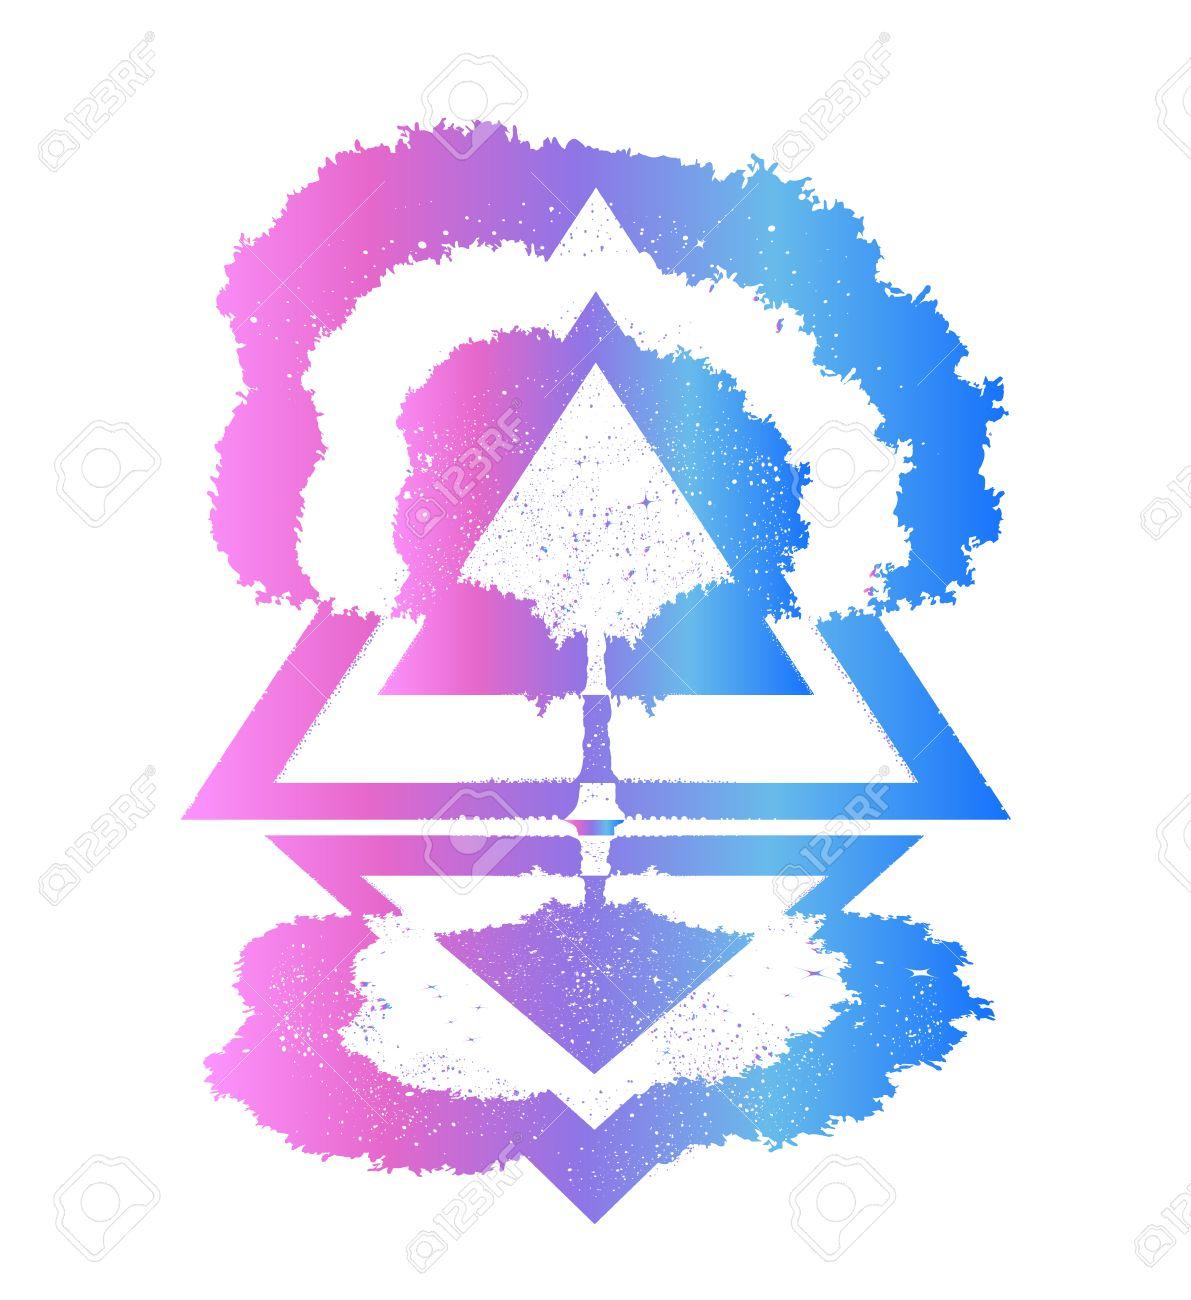 Magic tree tattoo and t-shirt design  Symbols of psychology,